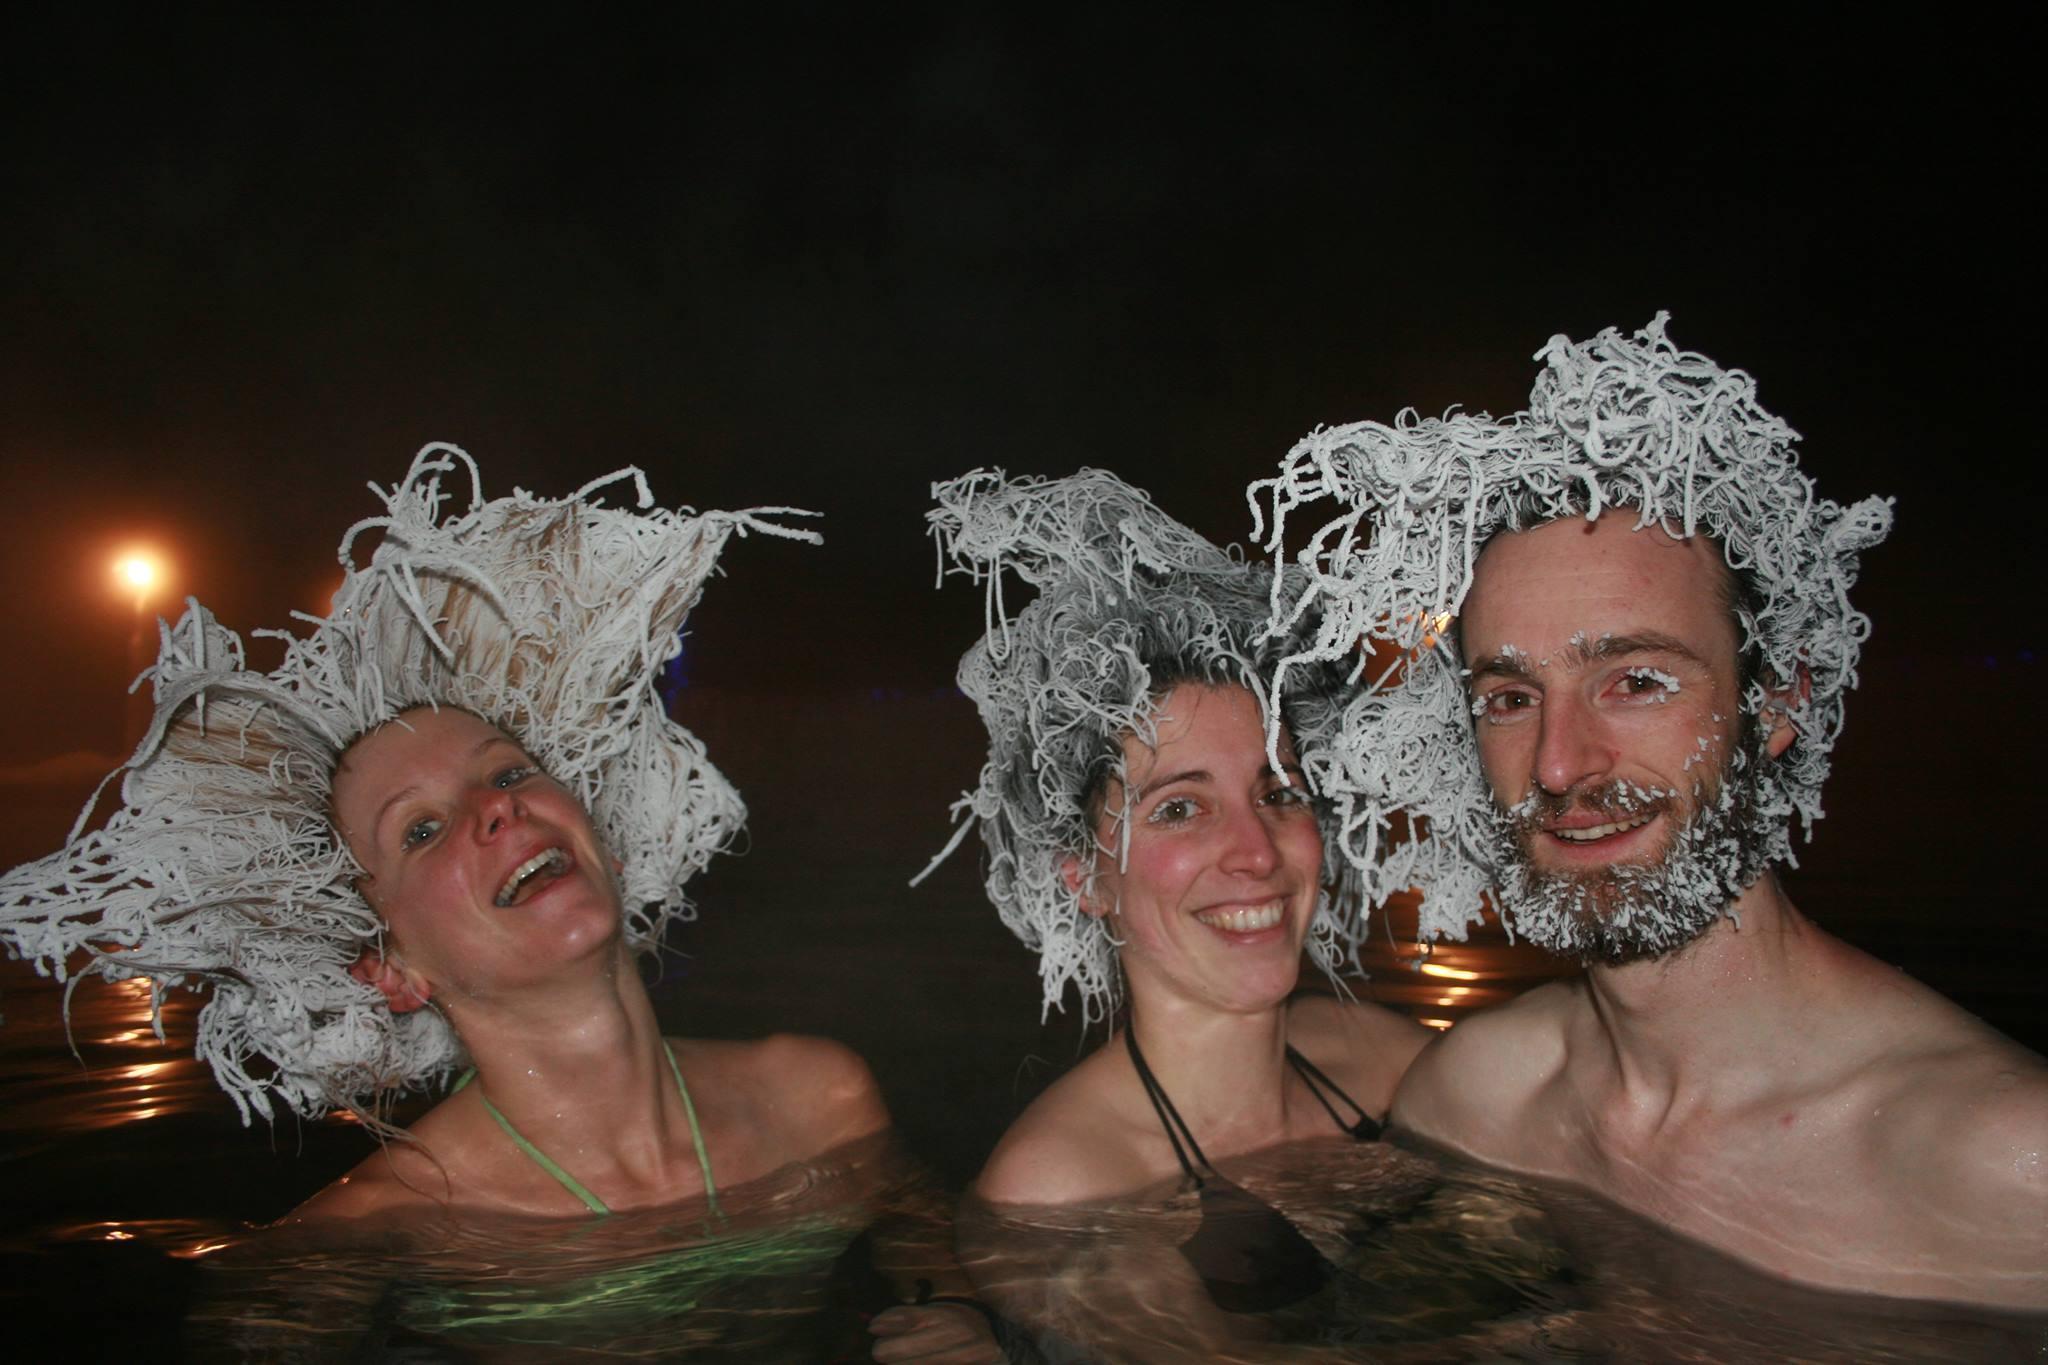 https://static.independent.co.uk/s3fs-public/thumbnails/image/2019/02/13/09/frozen-hair-15.jpg